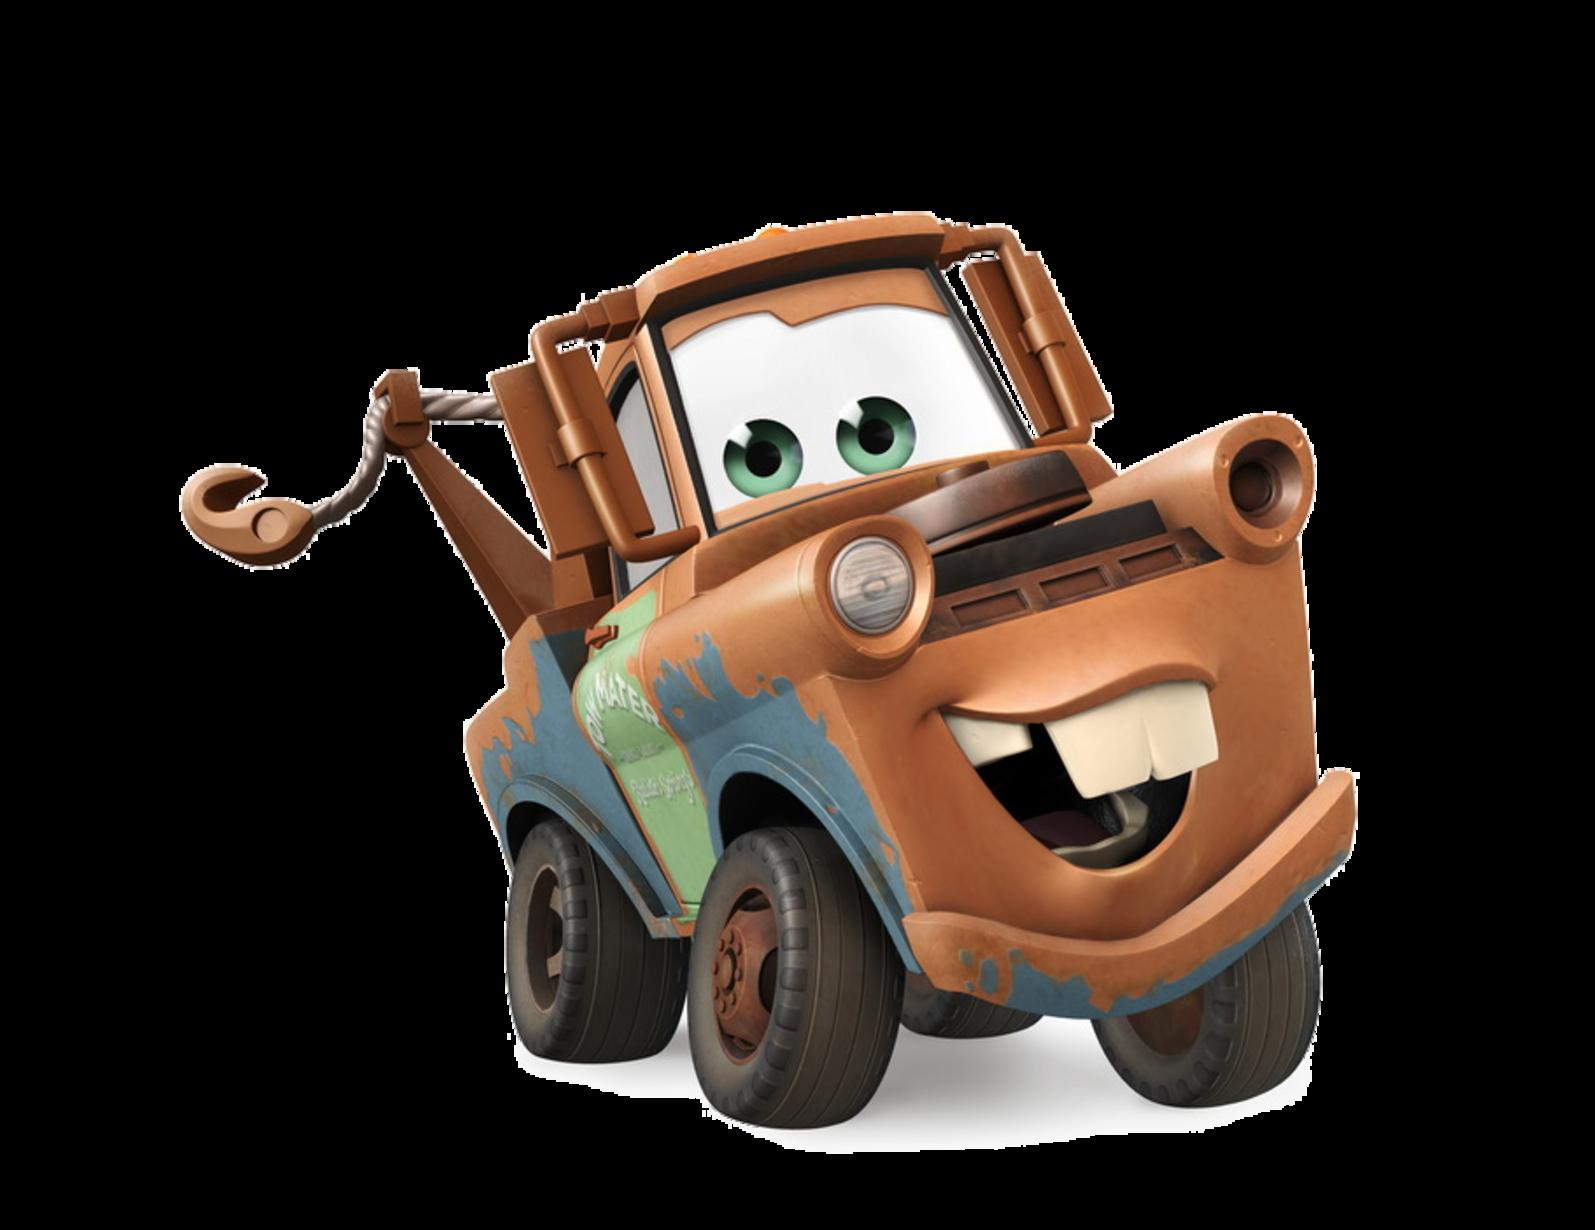 Uncategorized Mator From Cars tow mater amazon com hallmark disneypixar cars christmas